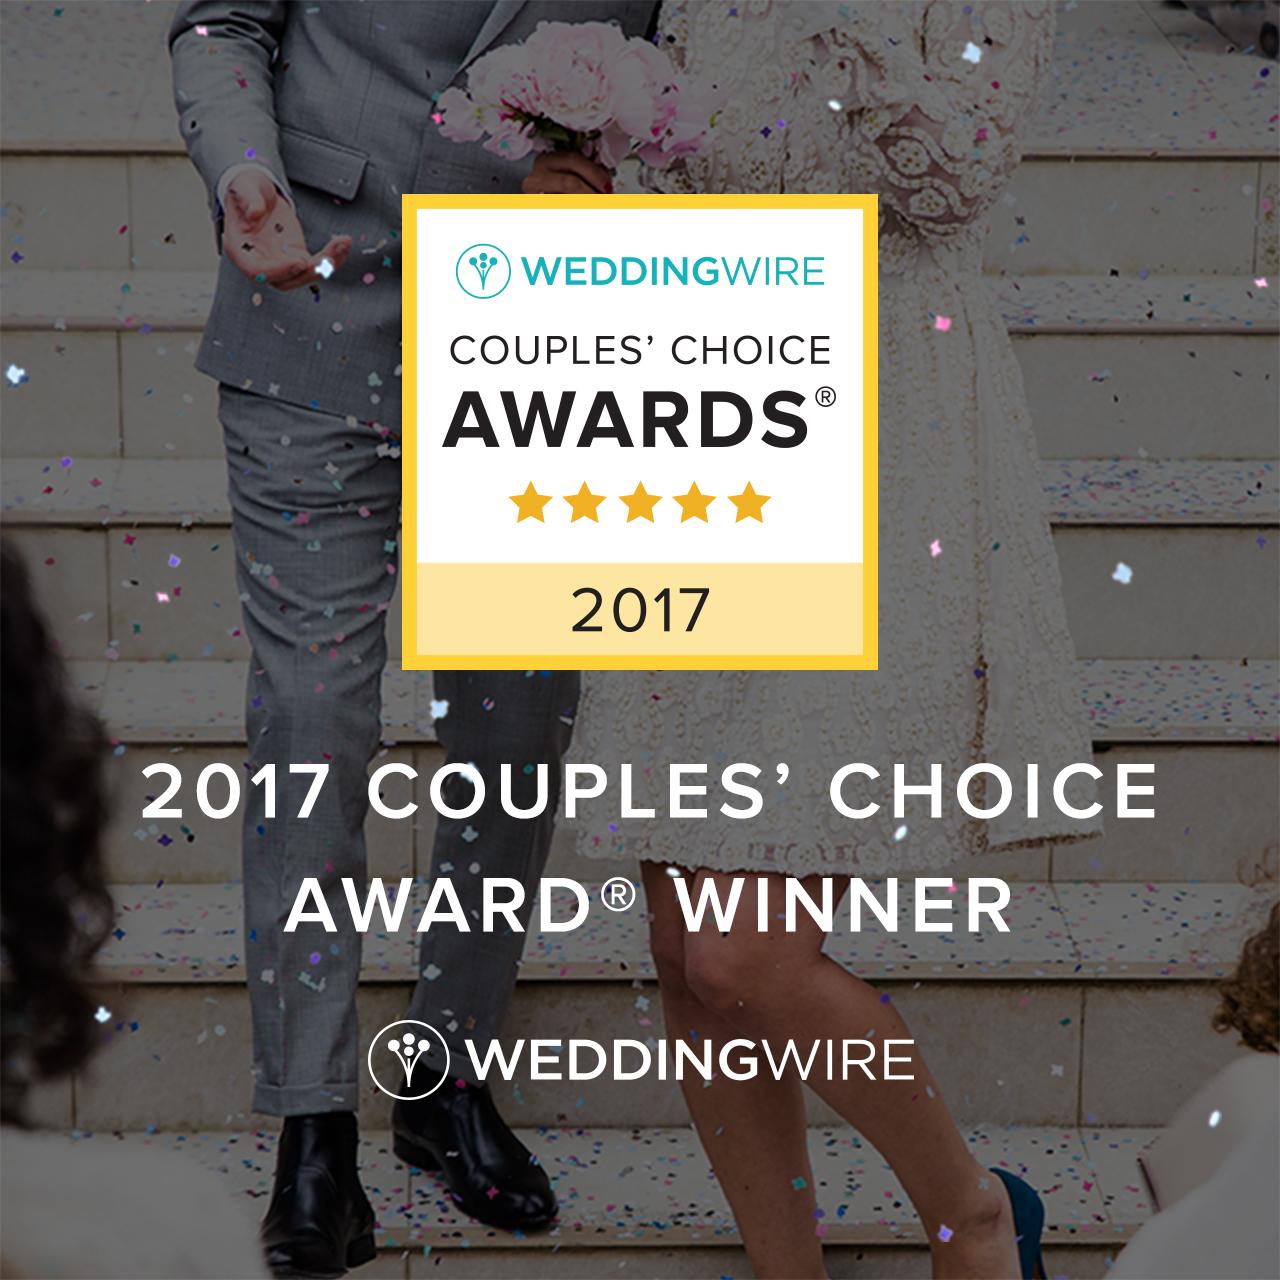 2017 Couples' Choice Award Winner